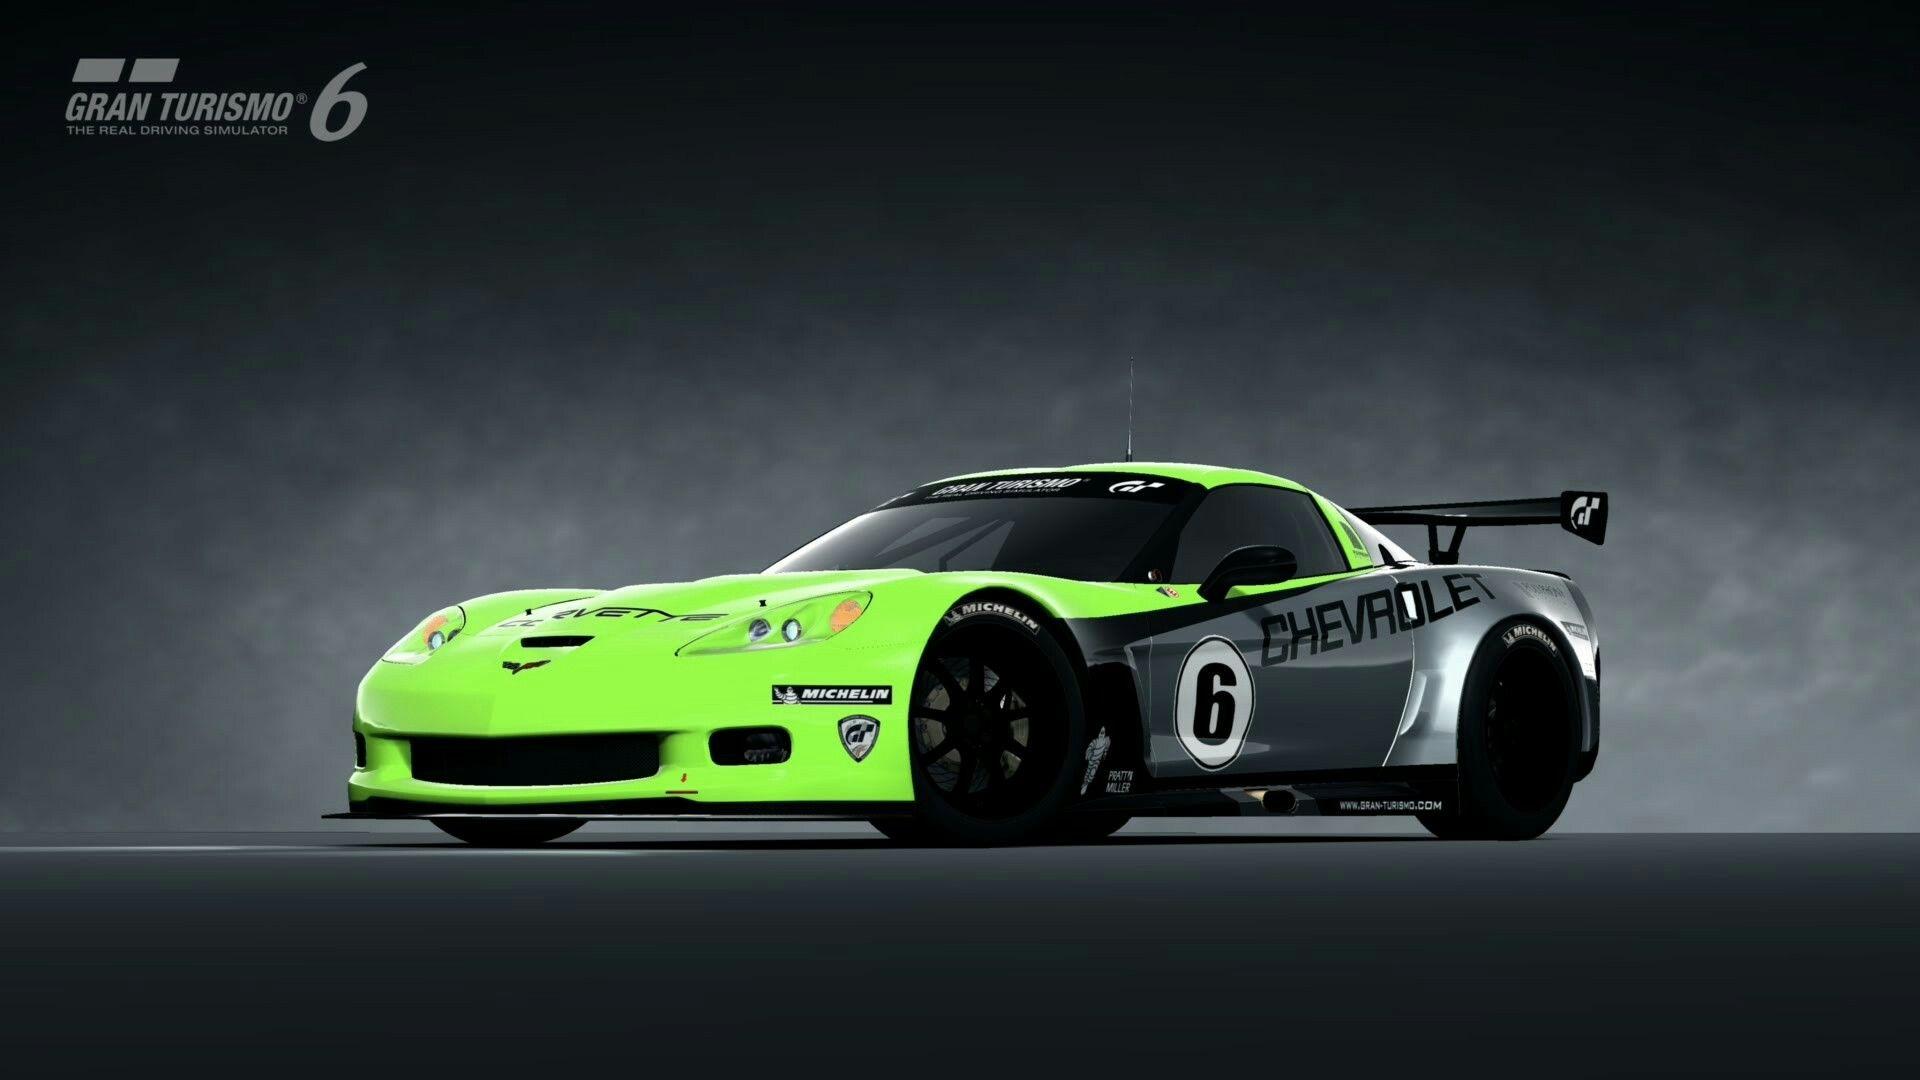 Gt6 tune chevrolet corvette z06 c6 lm race car 06 youtube